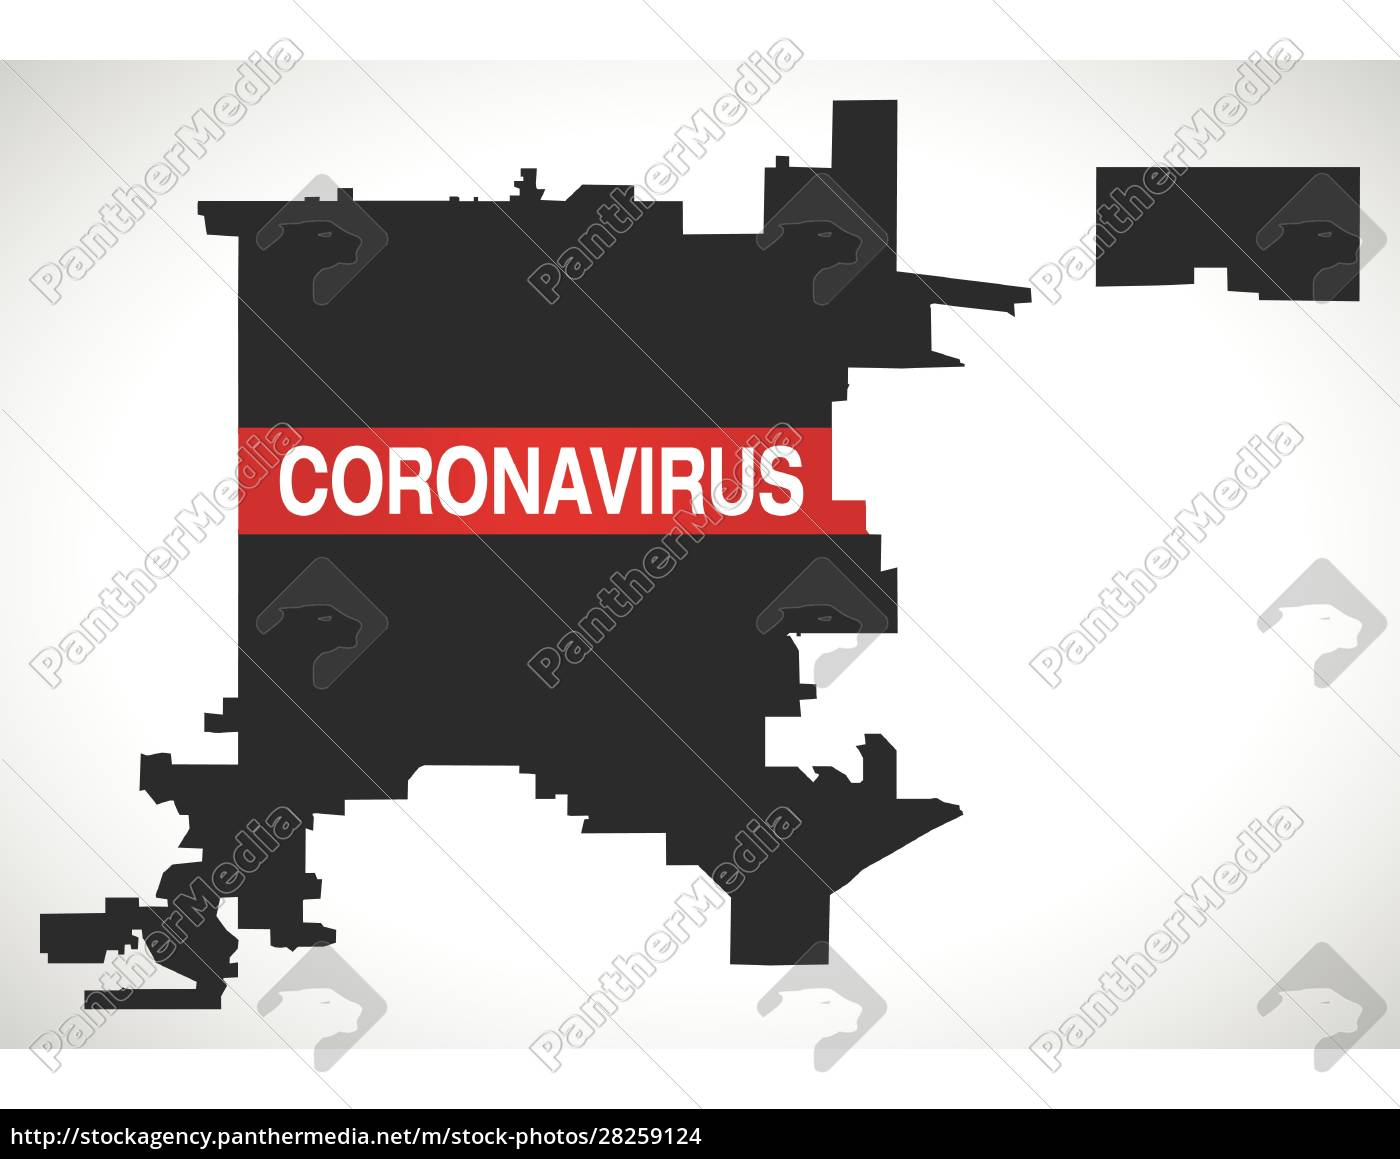 denver, colorado, city, map, with, coronavirus - 28259124